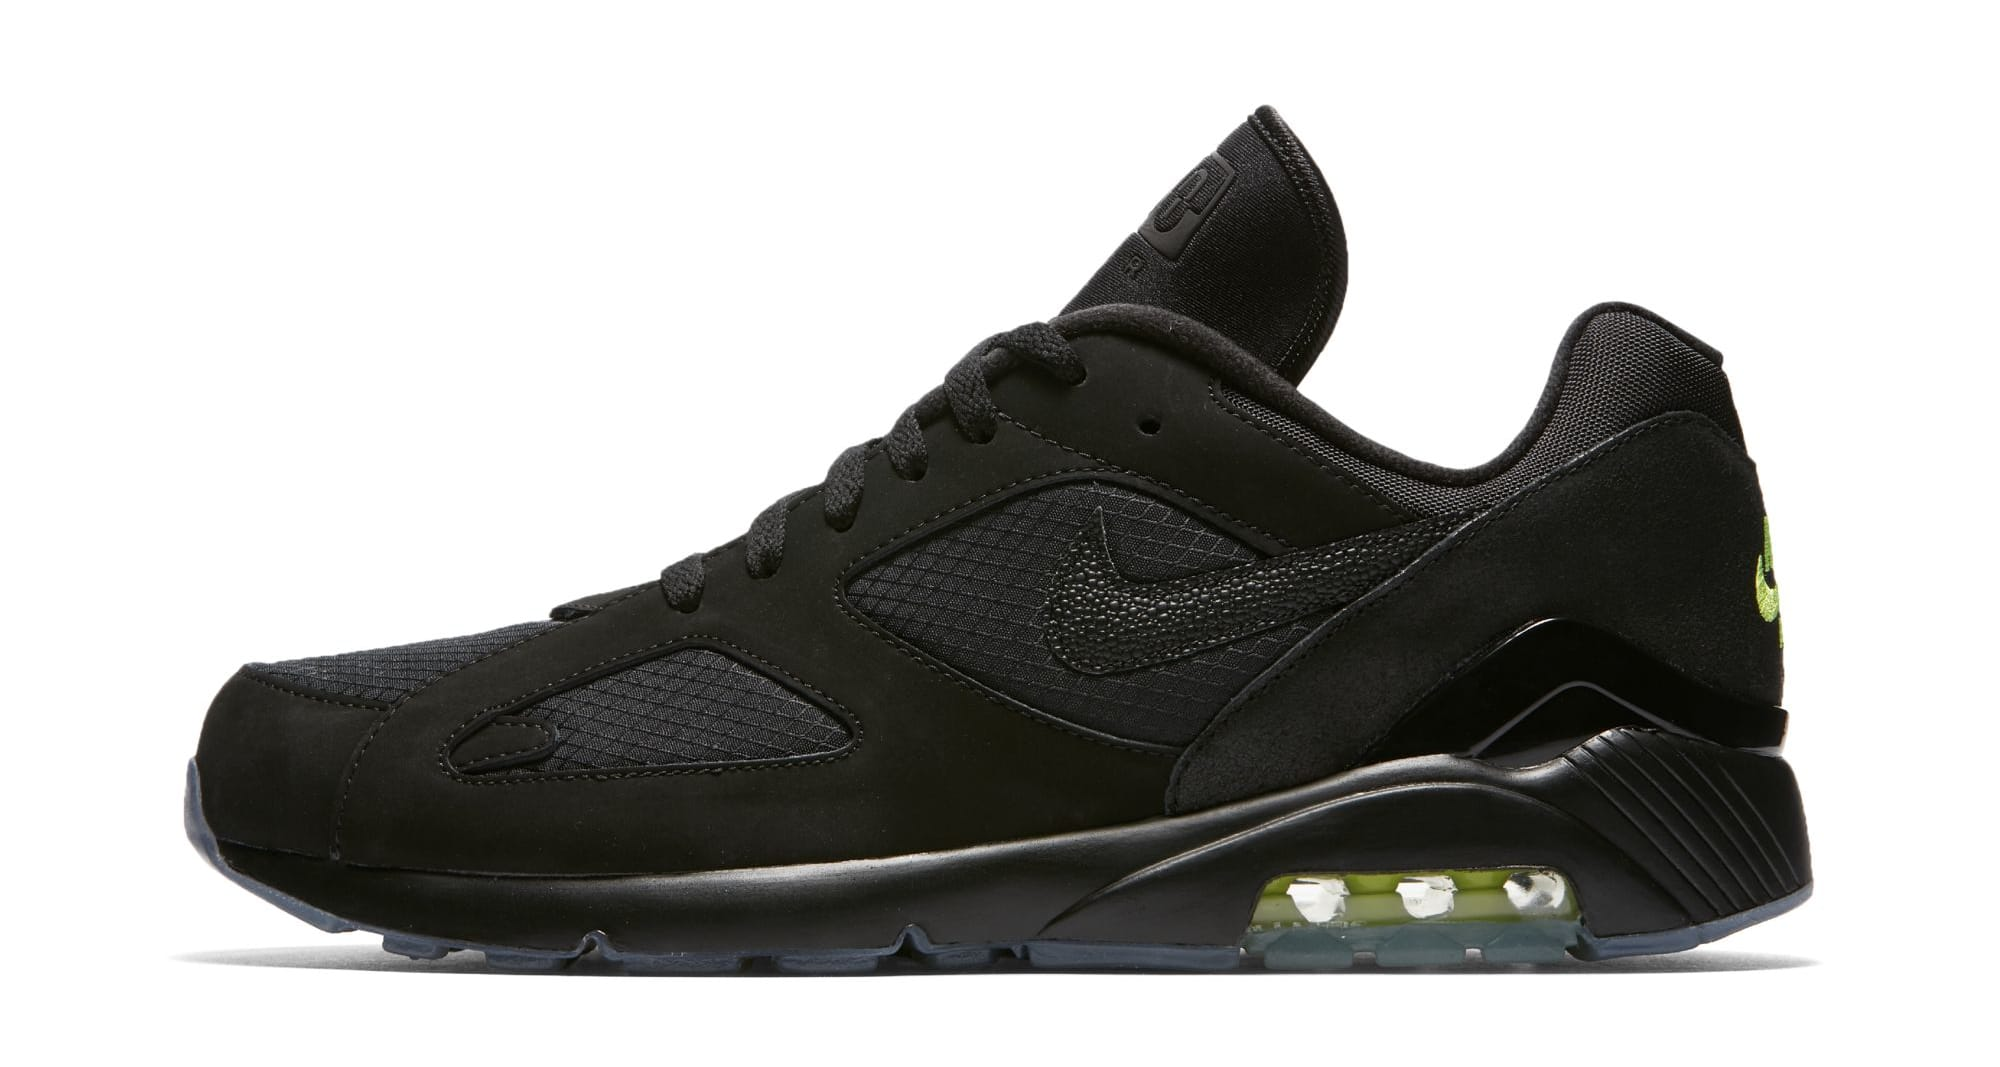 Force Niketalk Nike Air 74e44 838c6 Ireland 180 ybf6g7